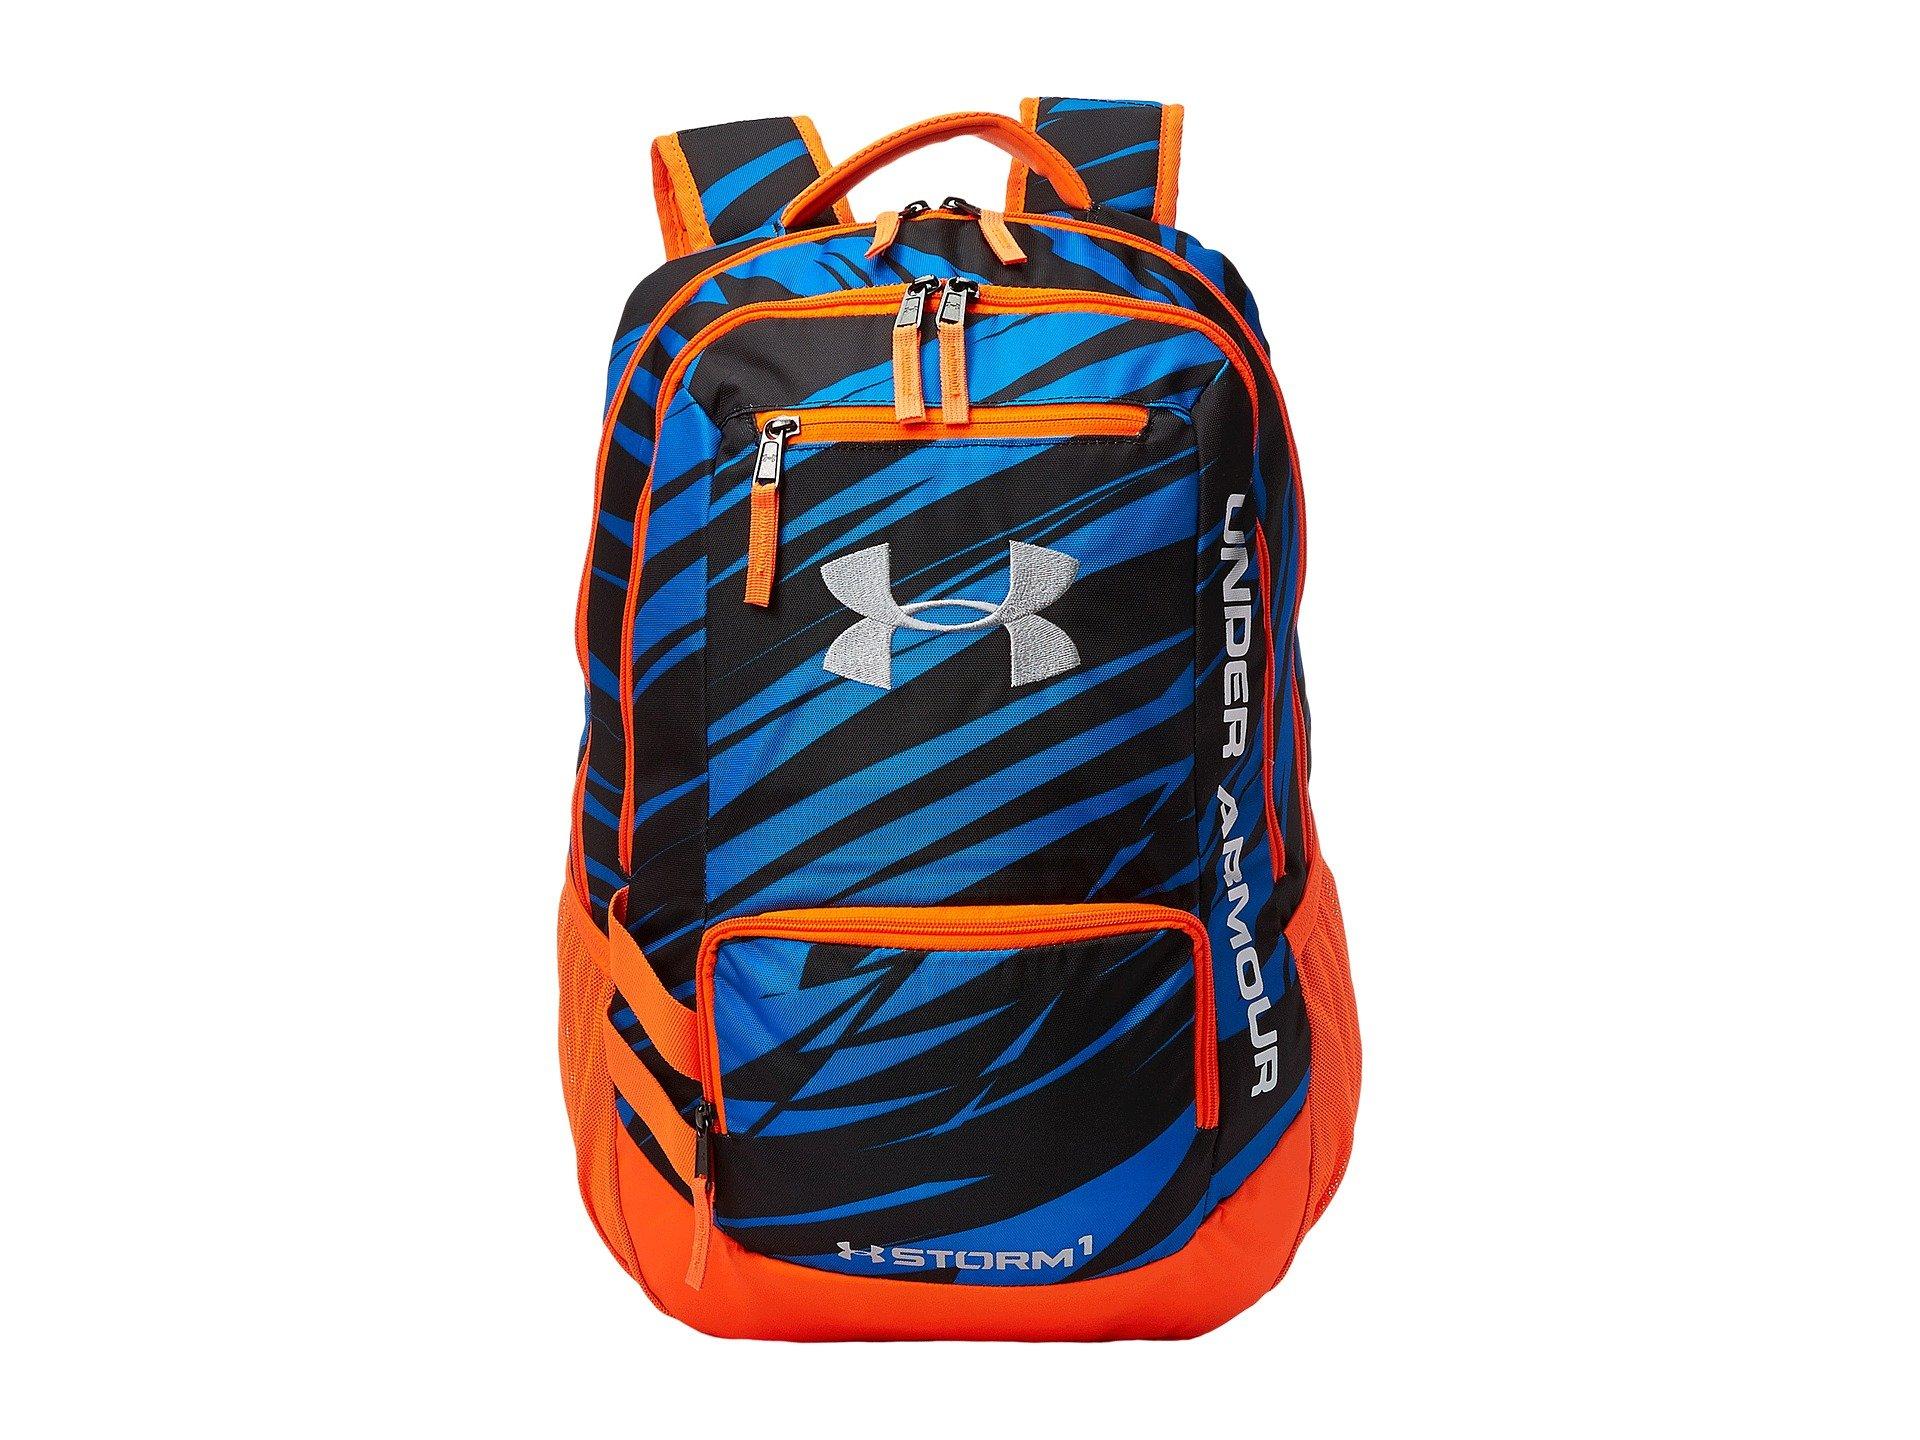 84b306ee38c Under Armour Scrimmage Laptop Mesh Backpack Blue Orange- Fenix ...